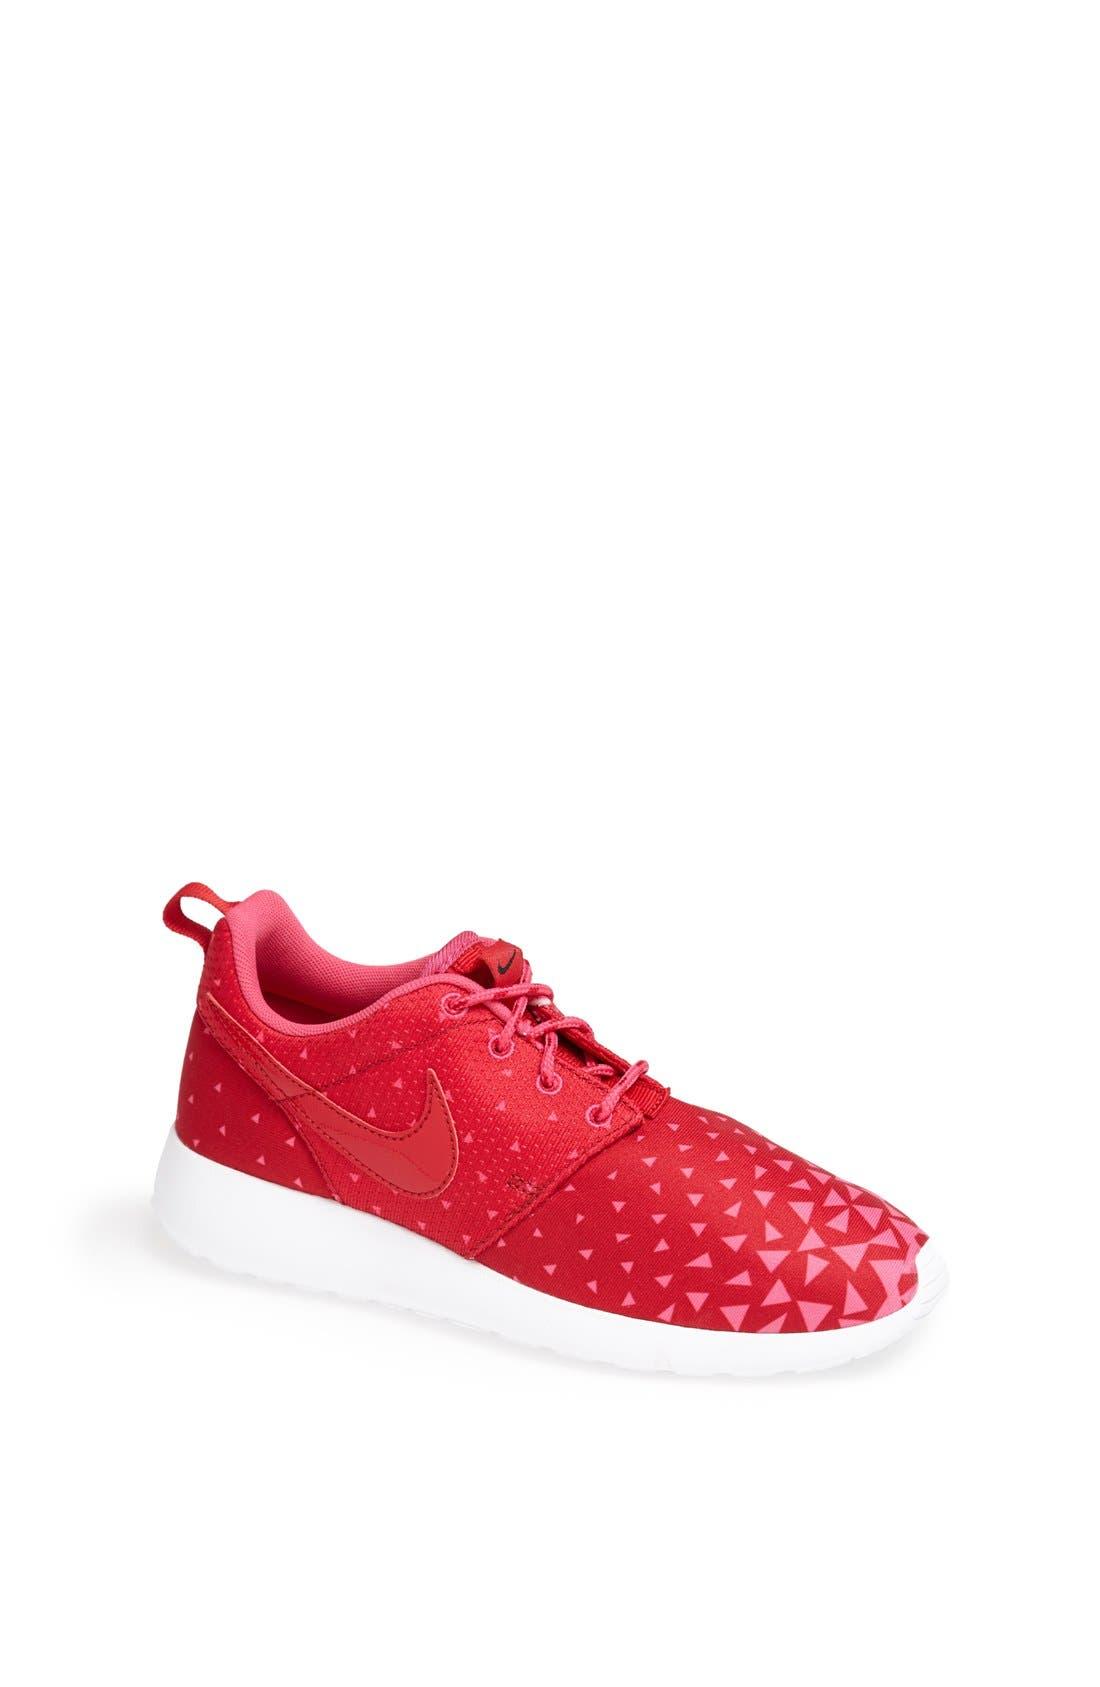 'Roshe Run' Athletic Shoe,                             Main thumbnail 43, color,